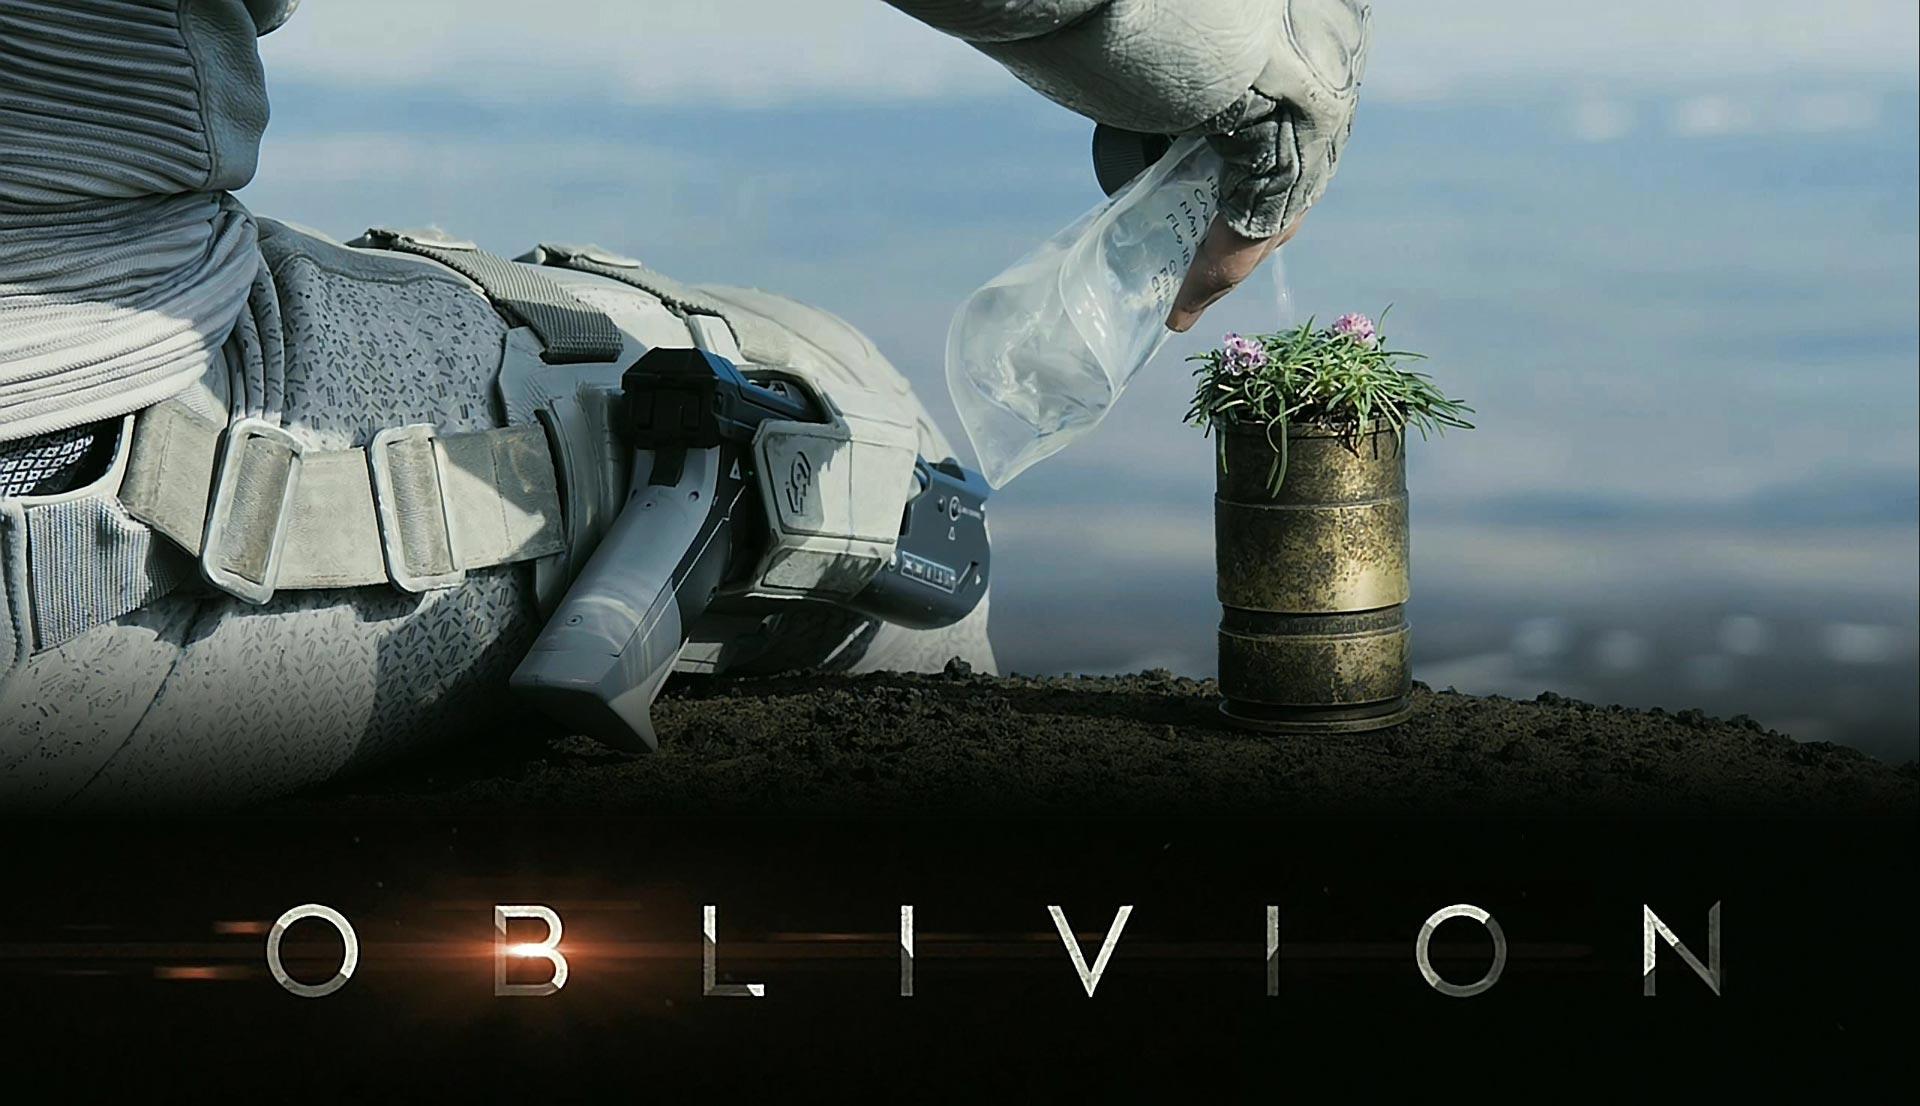 Oblivion Movie 2013 Wallpaper HD 1920x1106